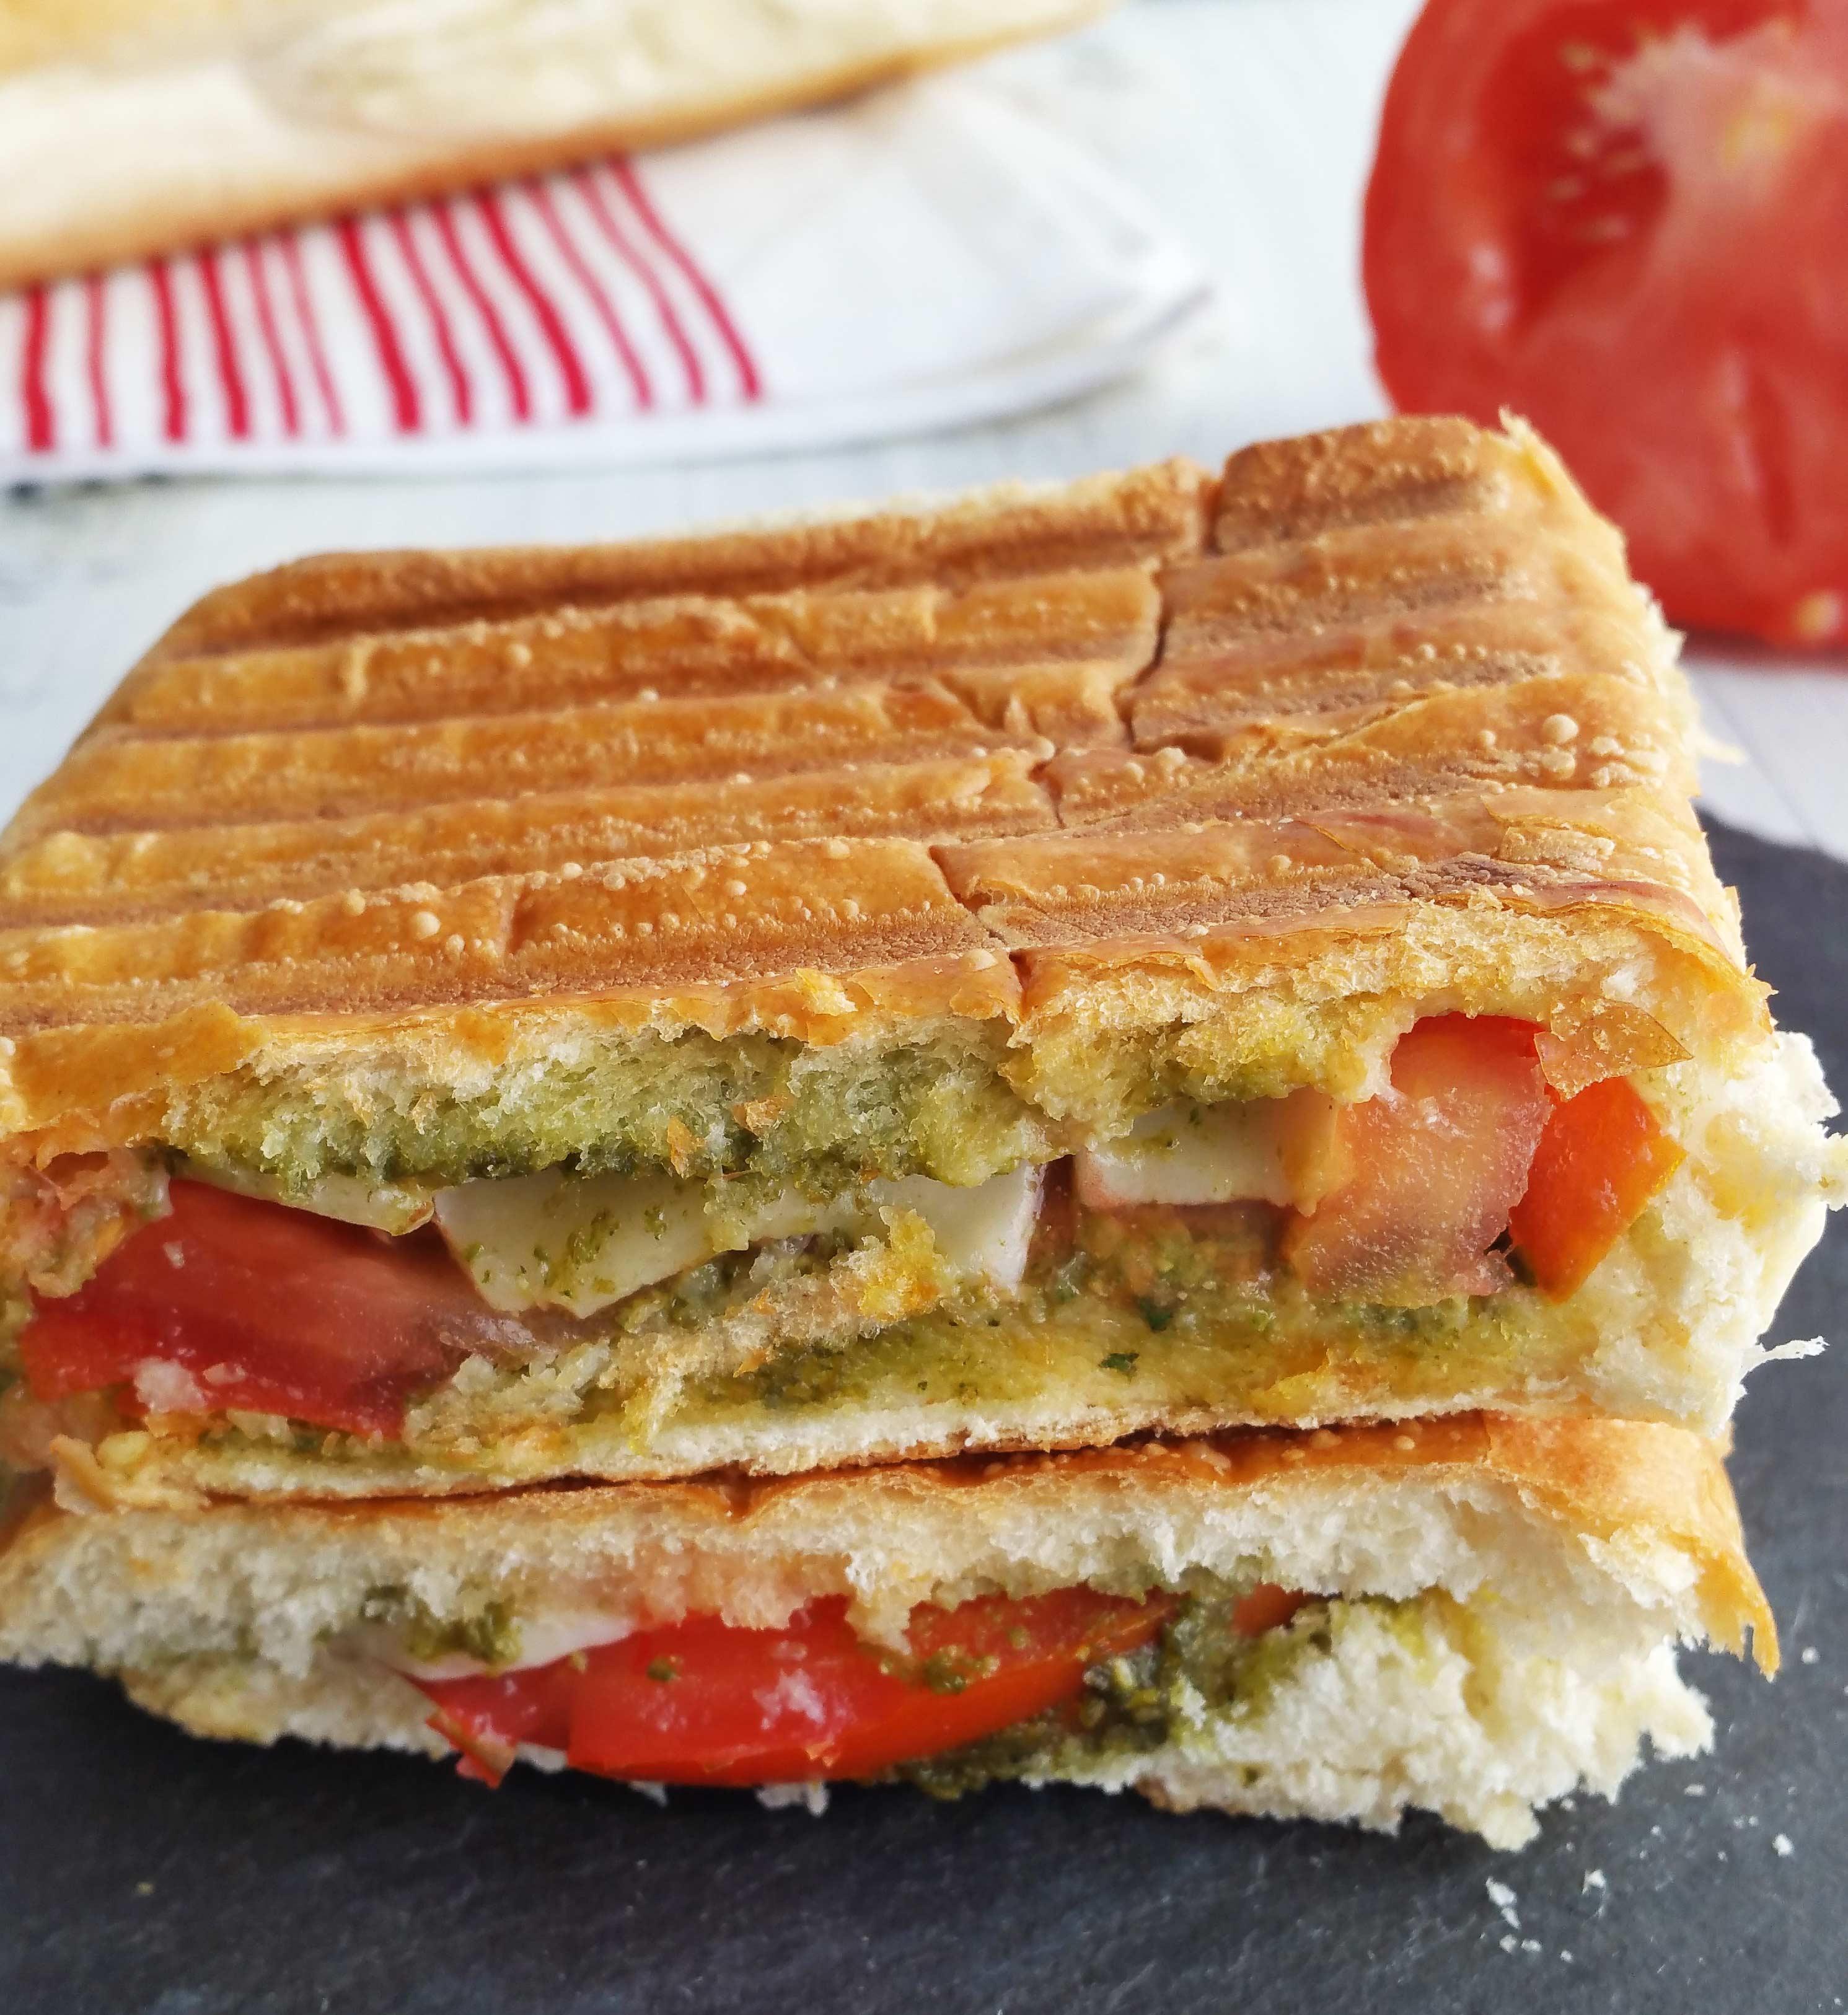 Tomato-Mozzarella-Panini